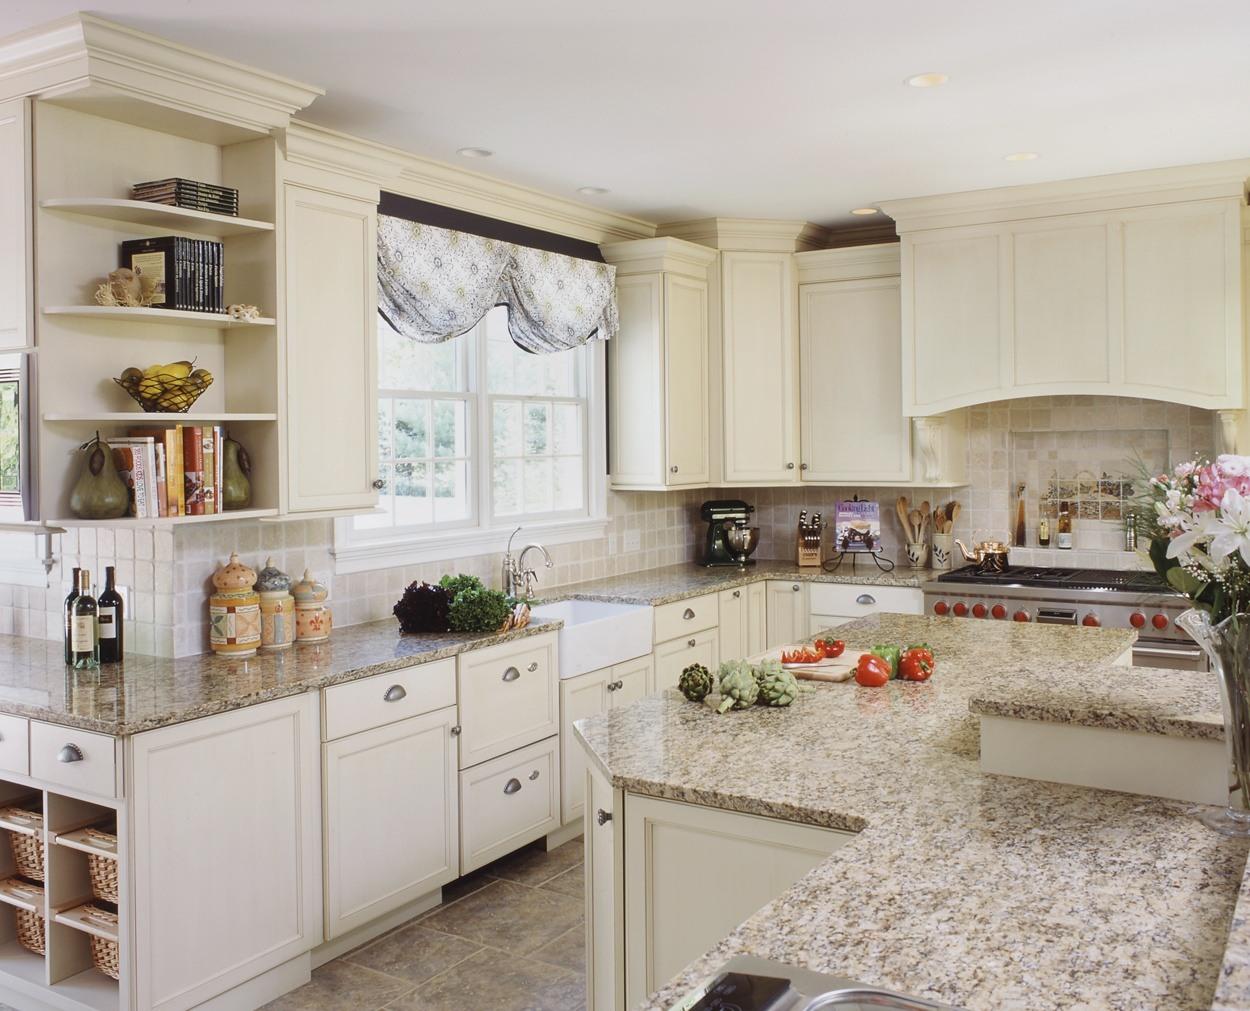 Creamy cabinets with a bi-level island and wrap around perimeter.